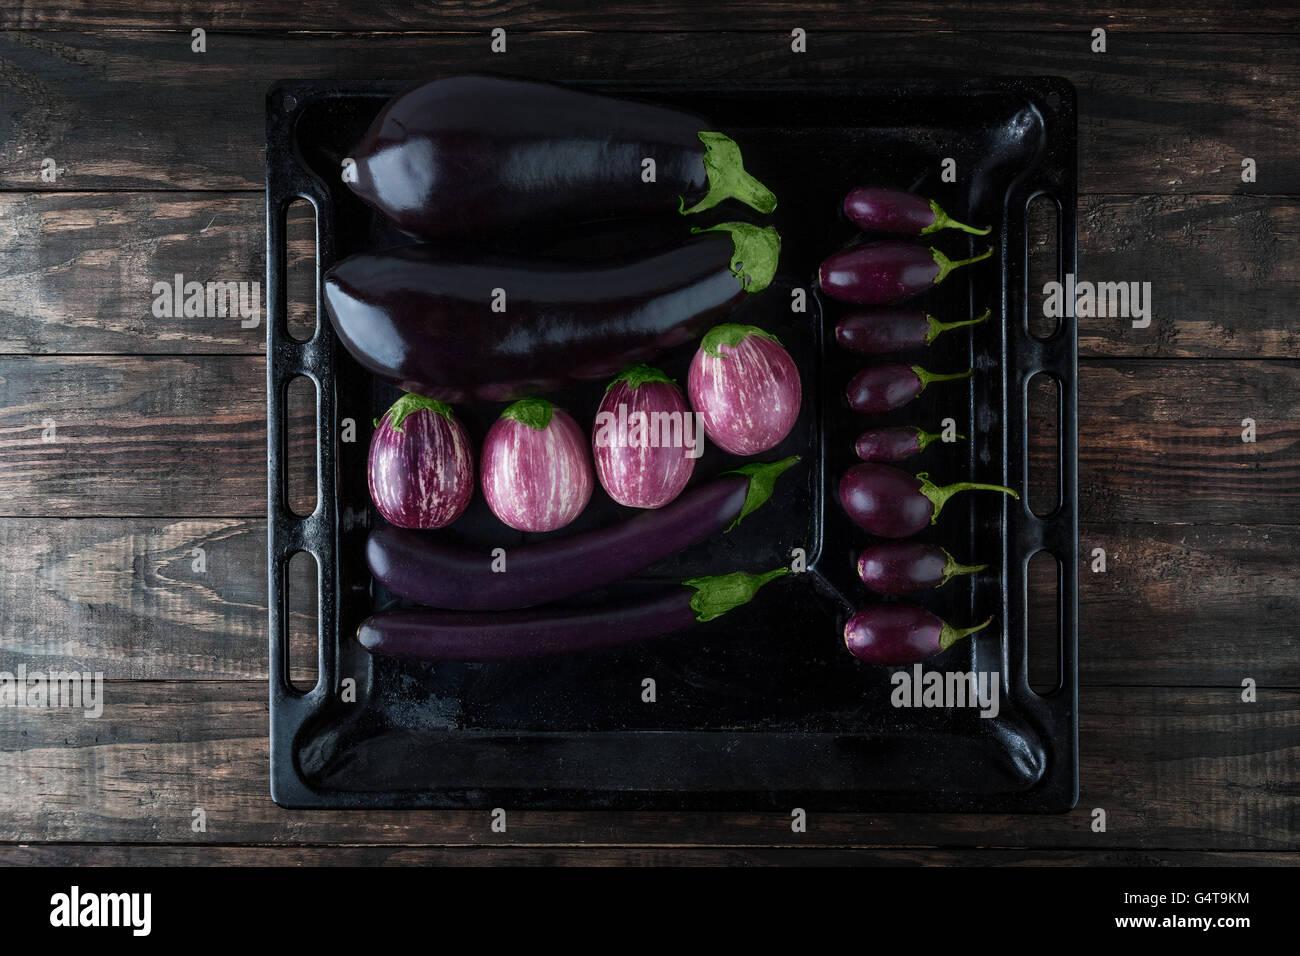 Auberginen Sorten auf rustikalen Backblech angeordnet. Draufsicht mit Textfreiraum Stockbild